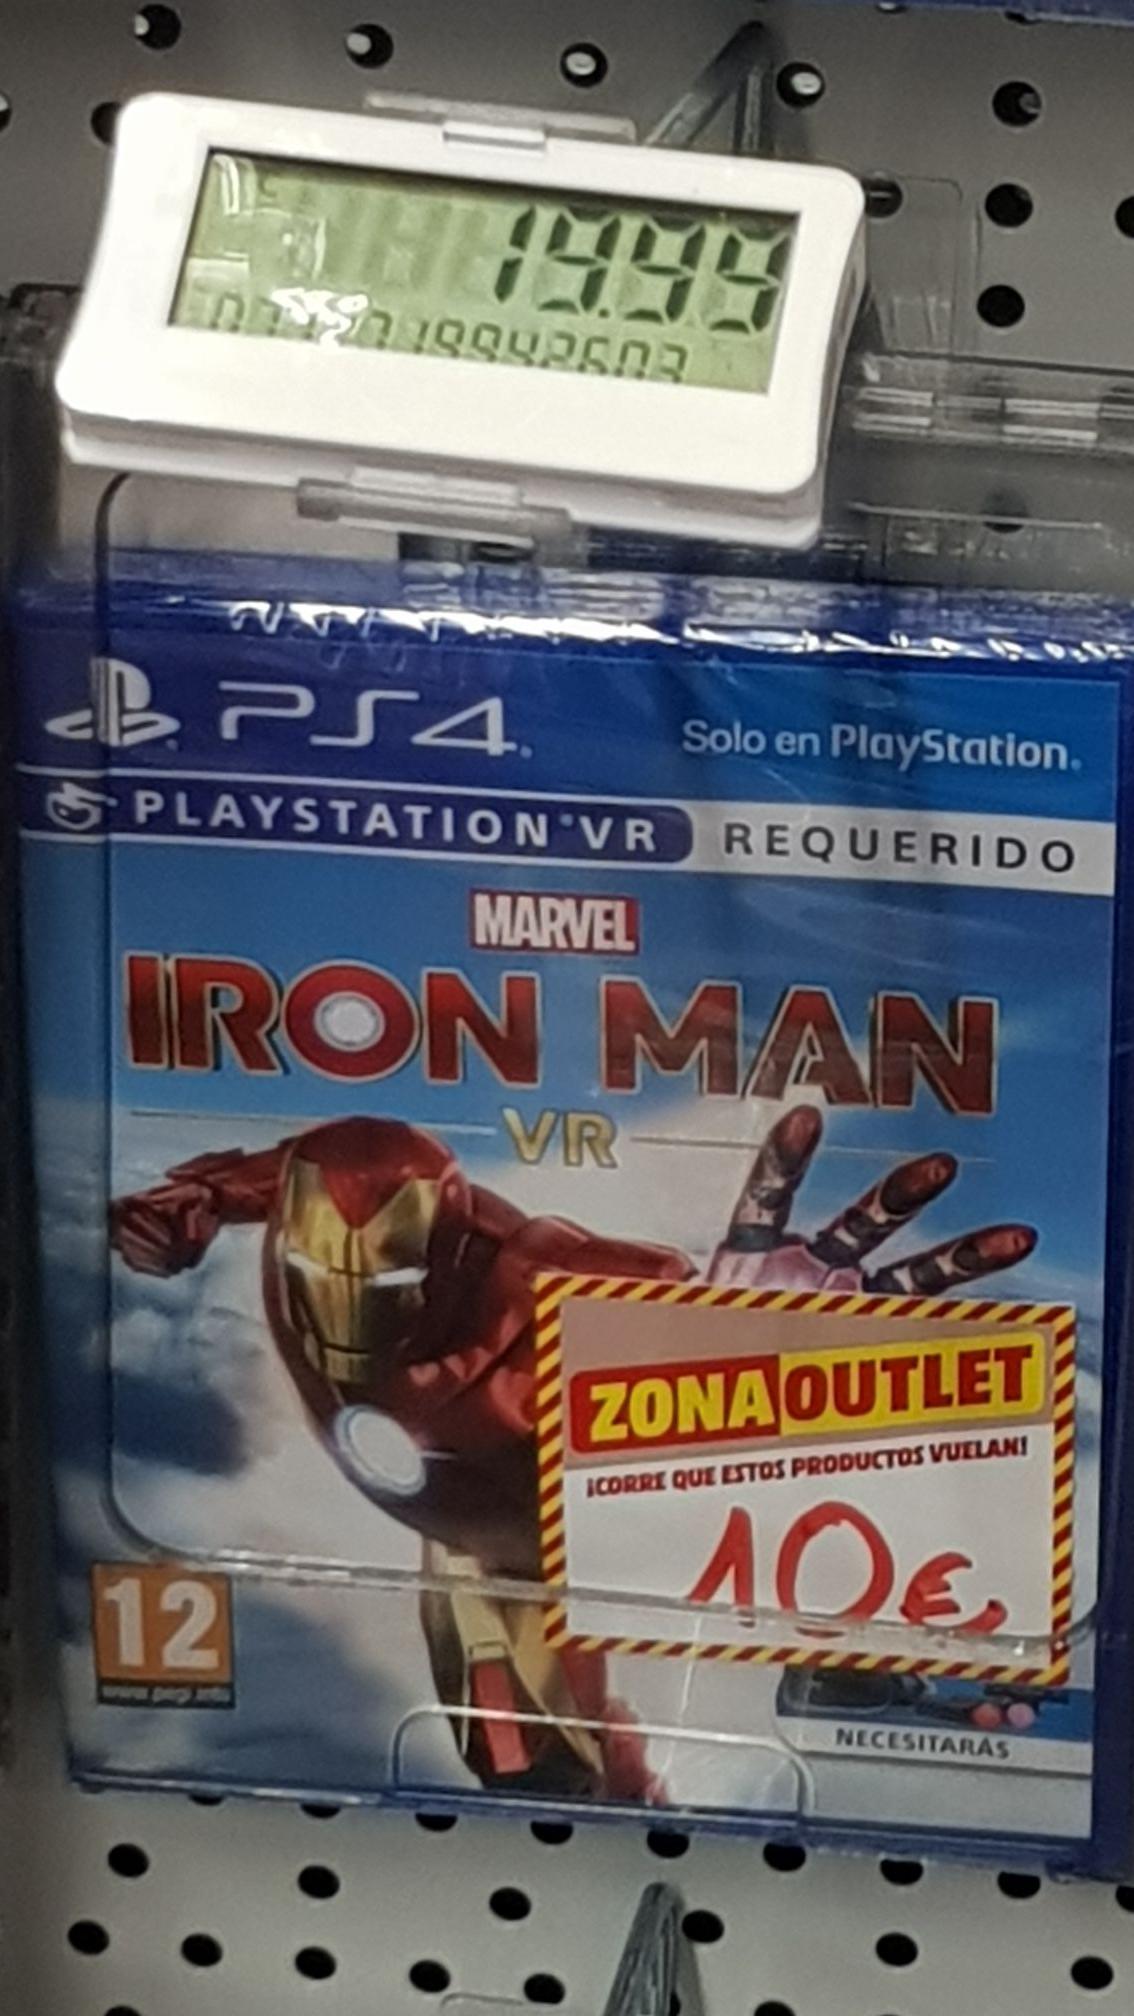 Iron Man VR ps4 en Media Markt de Castellon